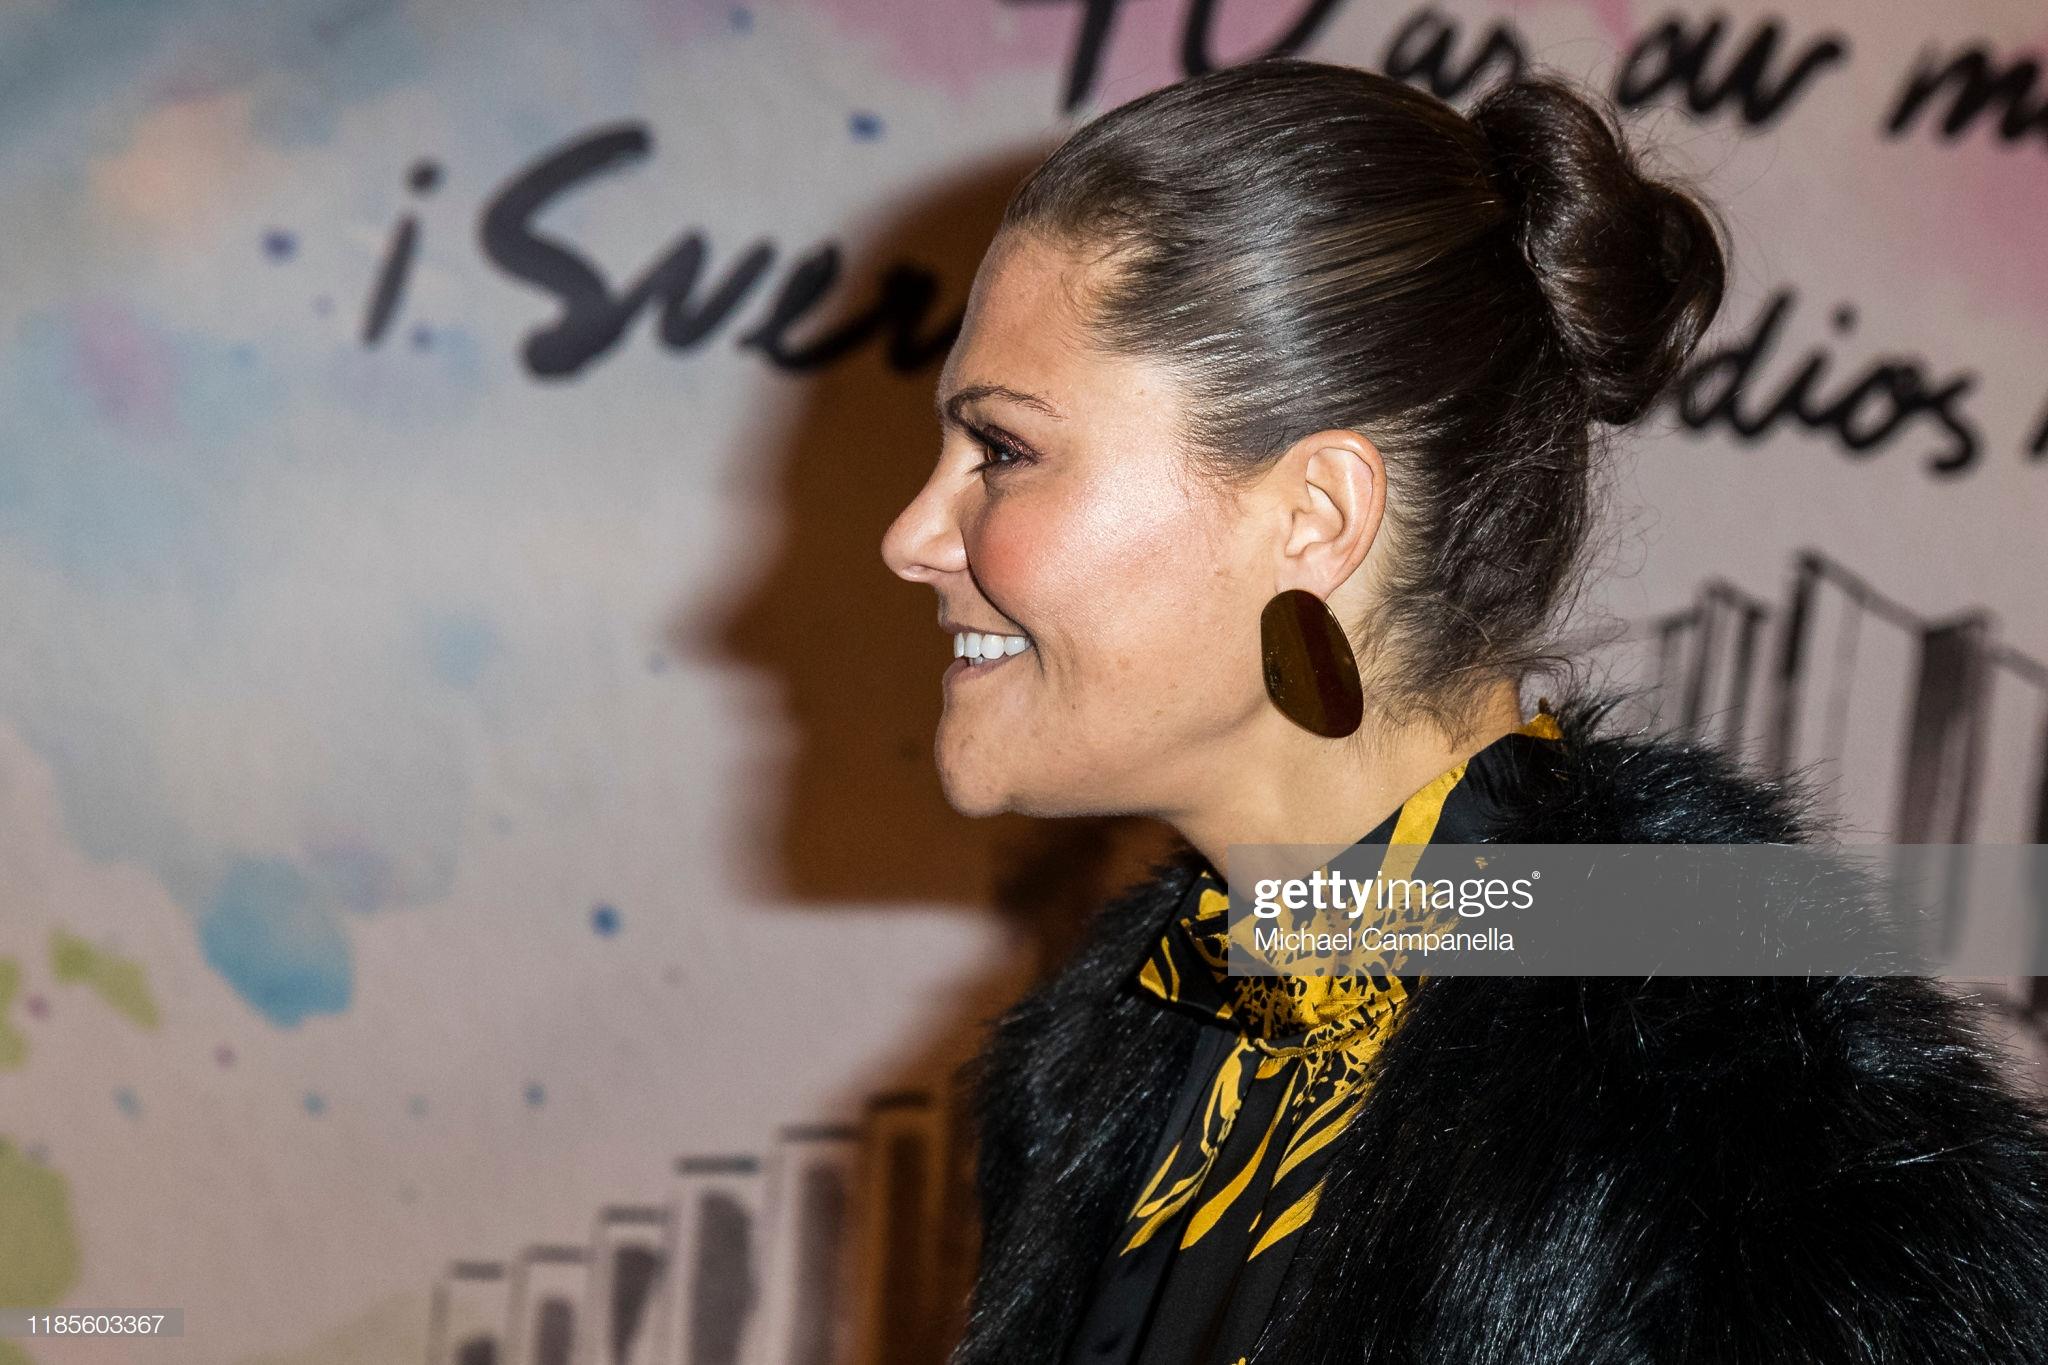 STOCKHOLM, SWEDEN - NOVEMBER 30: Crown Princess Victoria of Sweden arrives at Berwaldhallen to attend a concert in celebration of Berwaldhallens 40th anniversary on November 30, 2019 in Stockholm, Sweden. (Photo by Michael Campanella/Getty Images)